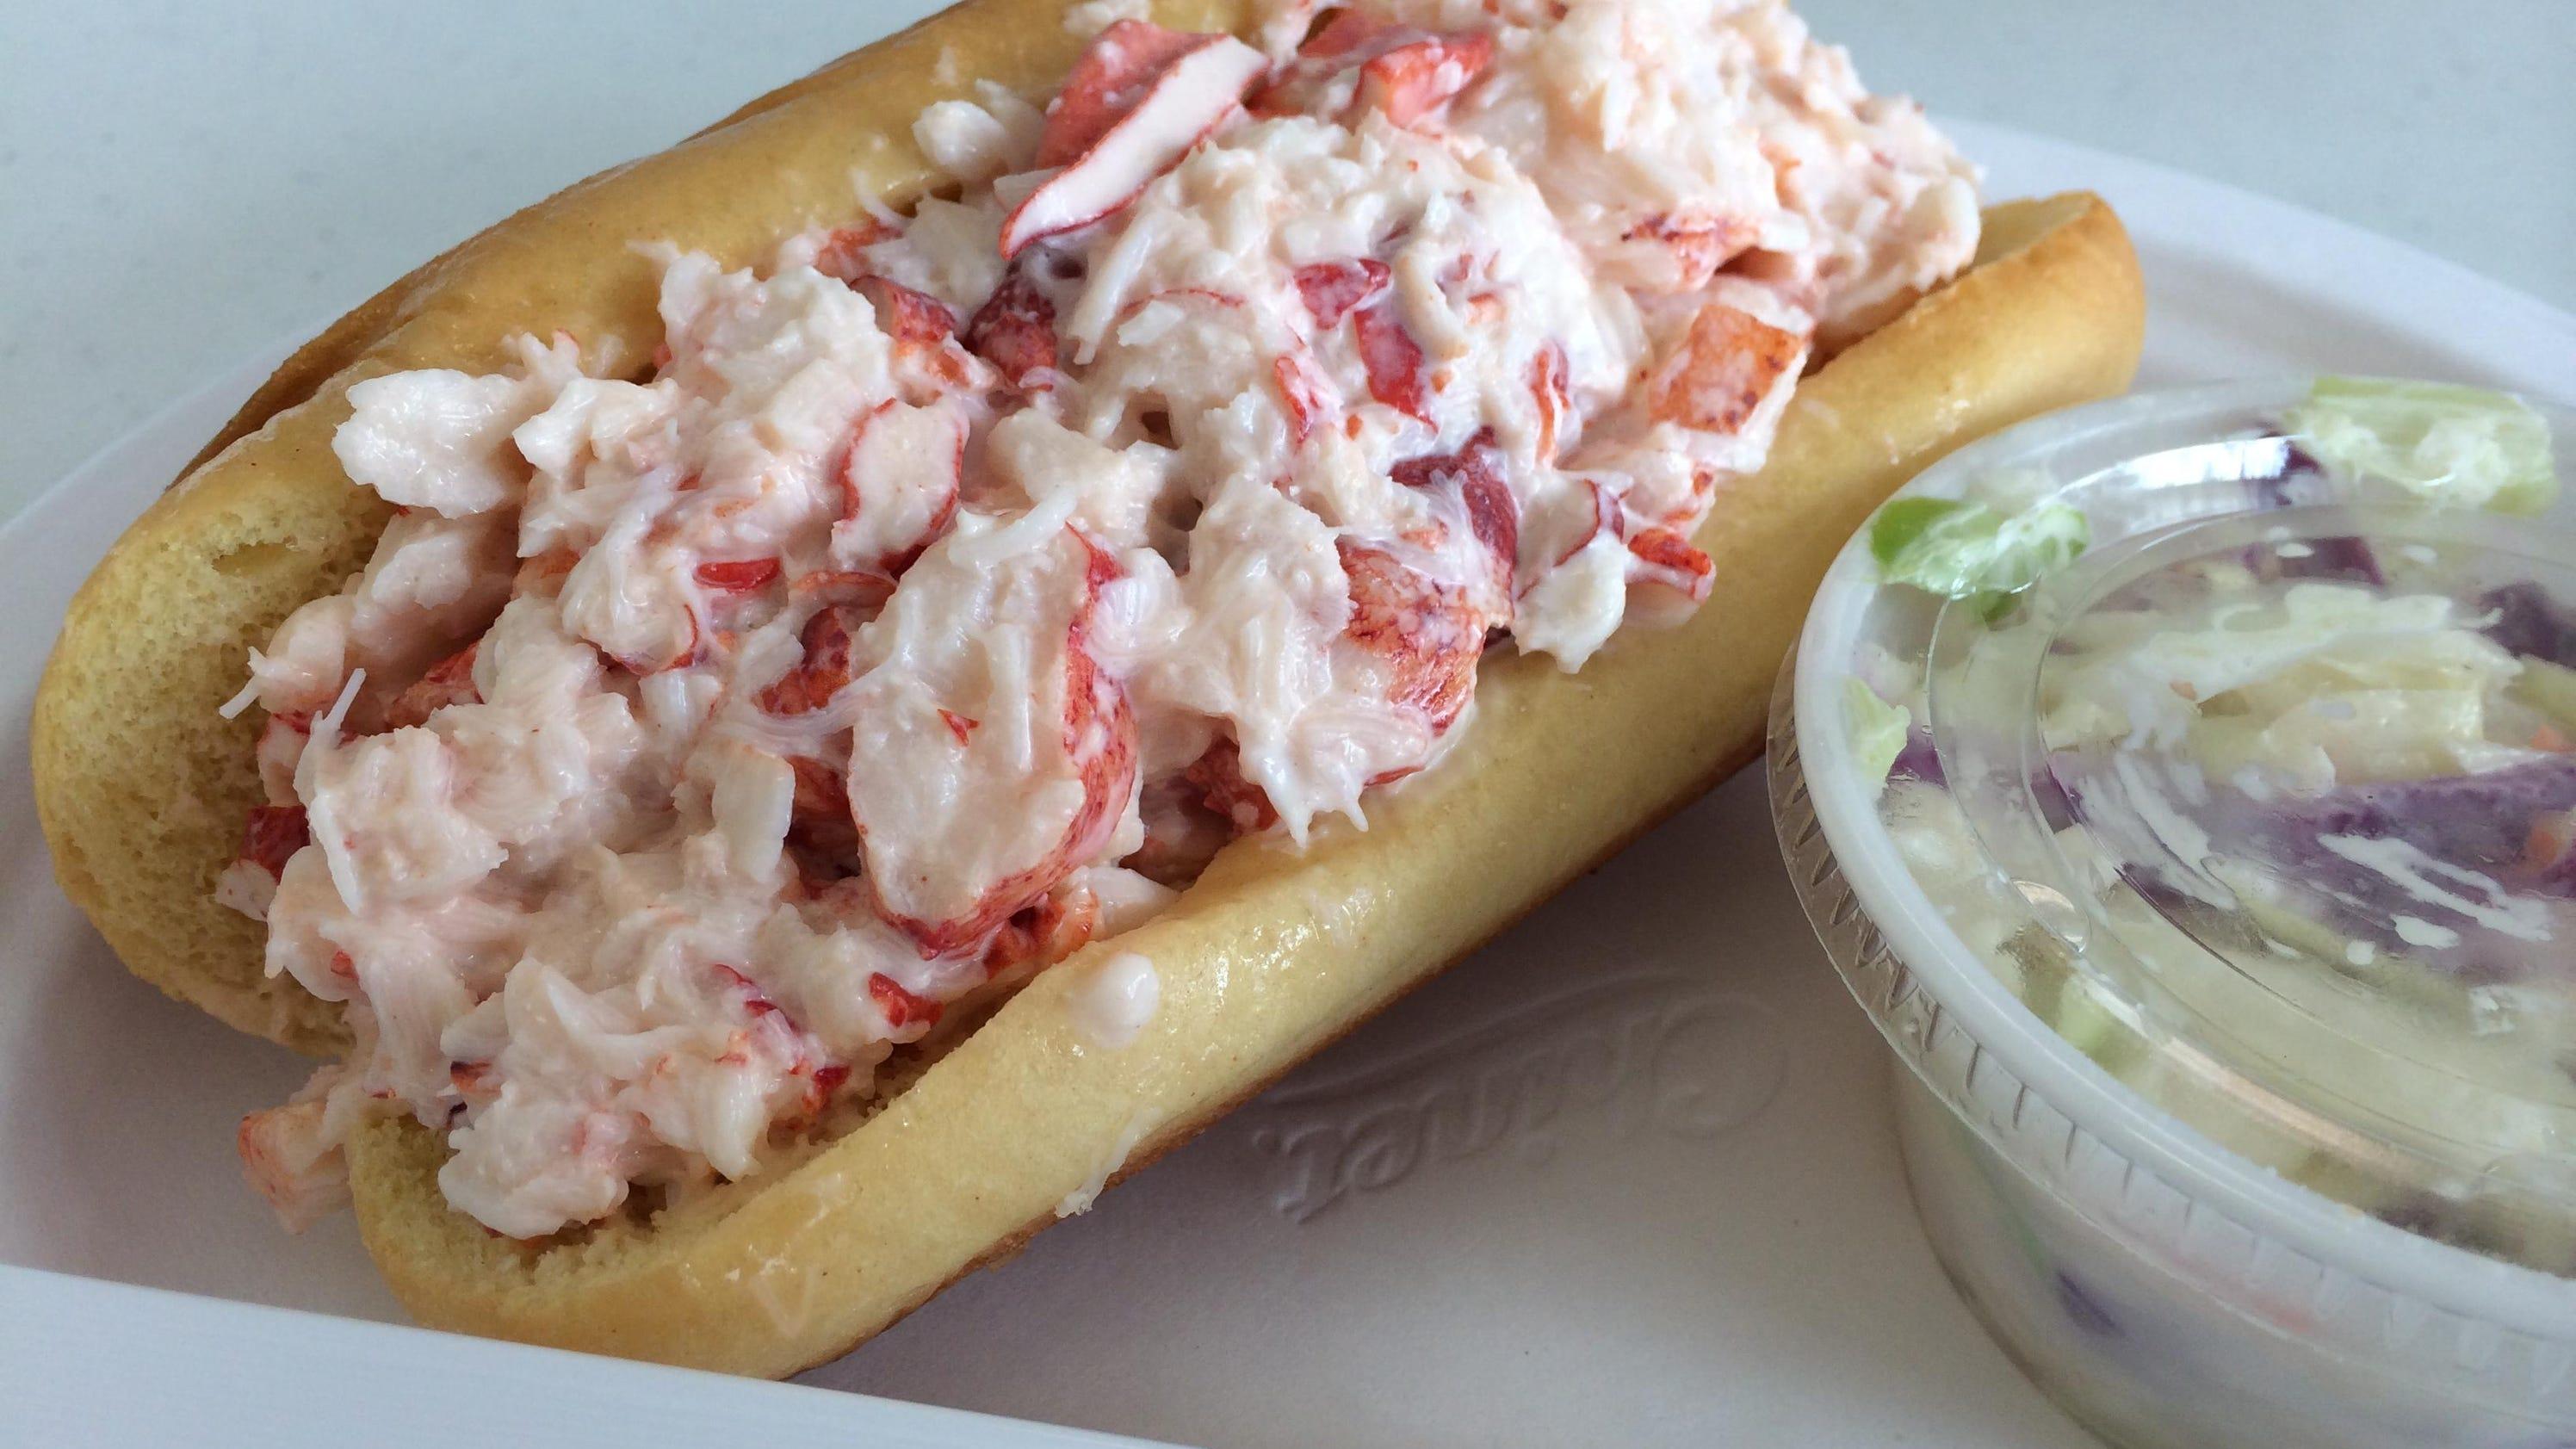 Seafood restaurants jlb 39 s picks from fort myers to naples for Fish restaurant fort myers